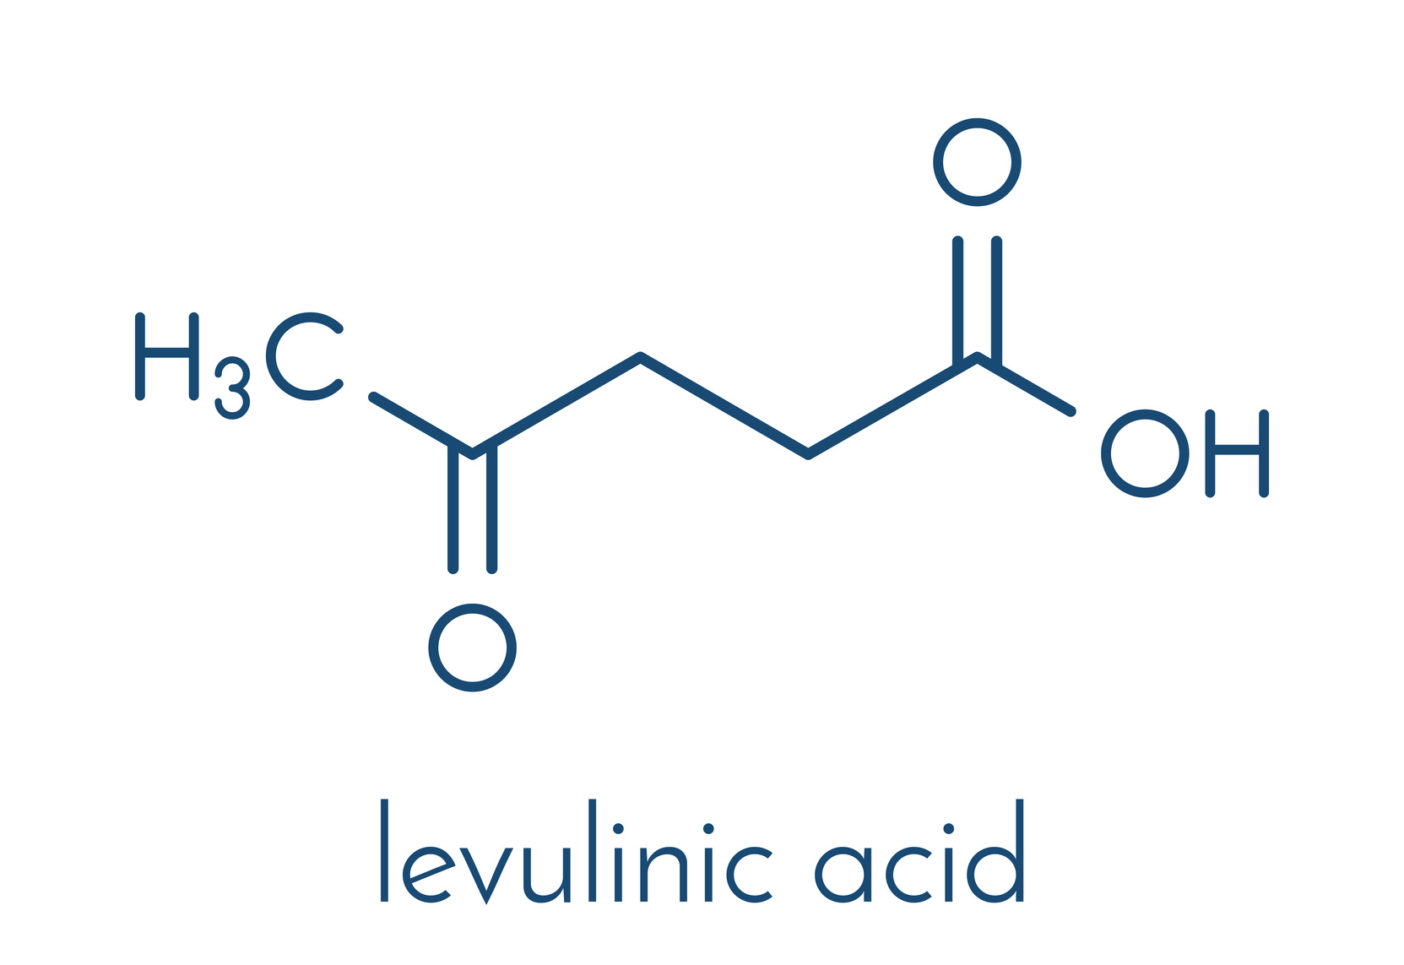 Lävulinsäure; Sodium Levulinate; Levulinic Acid